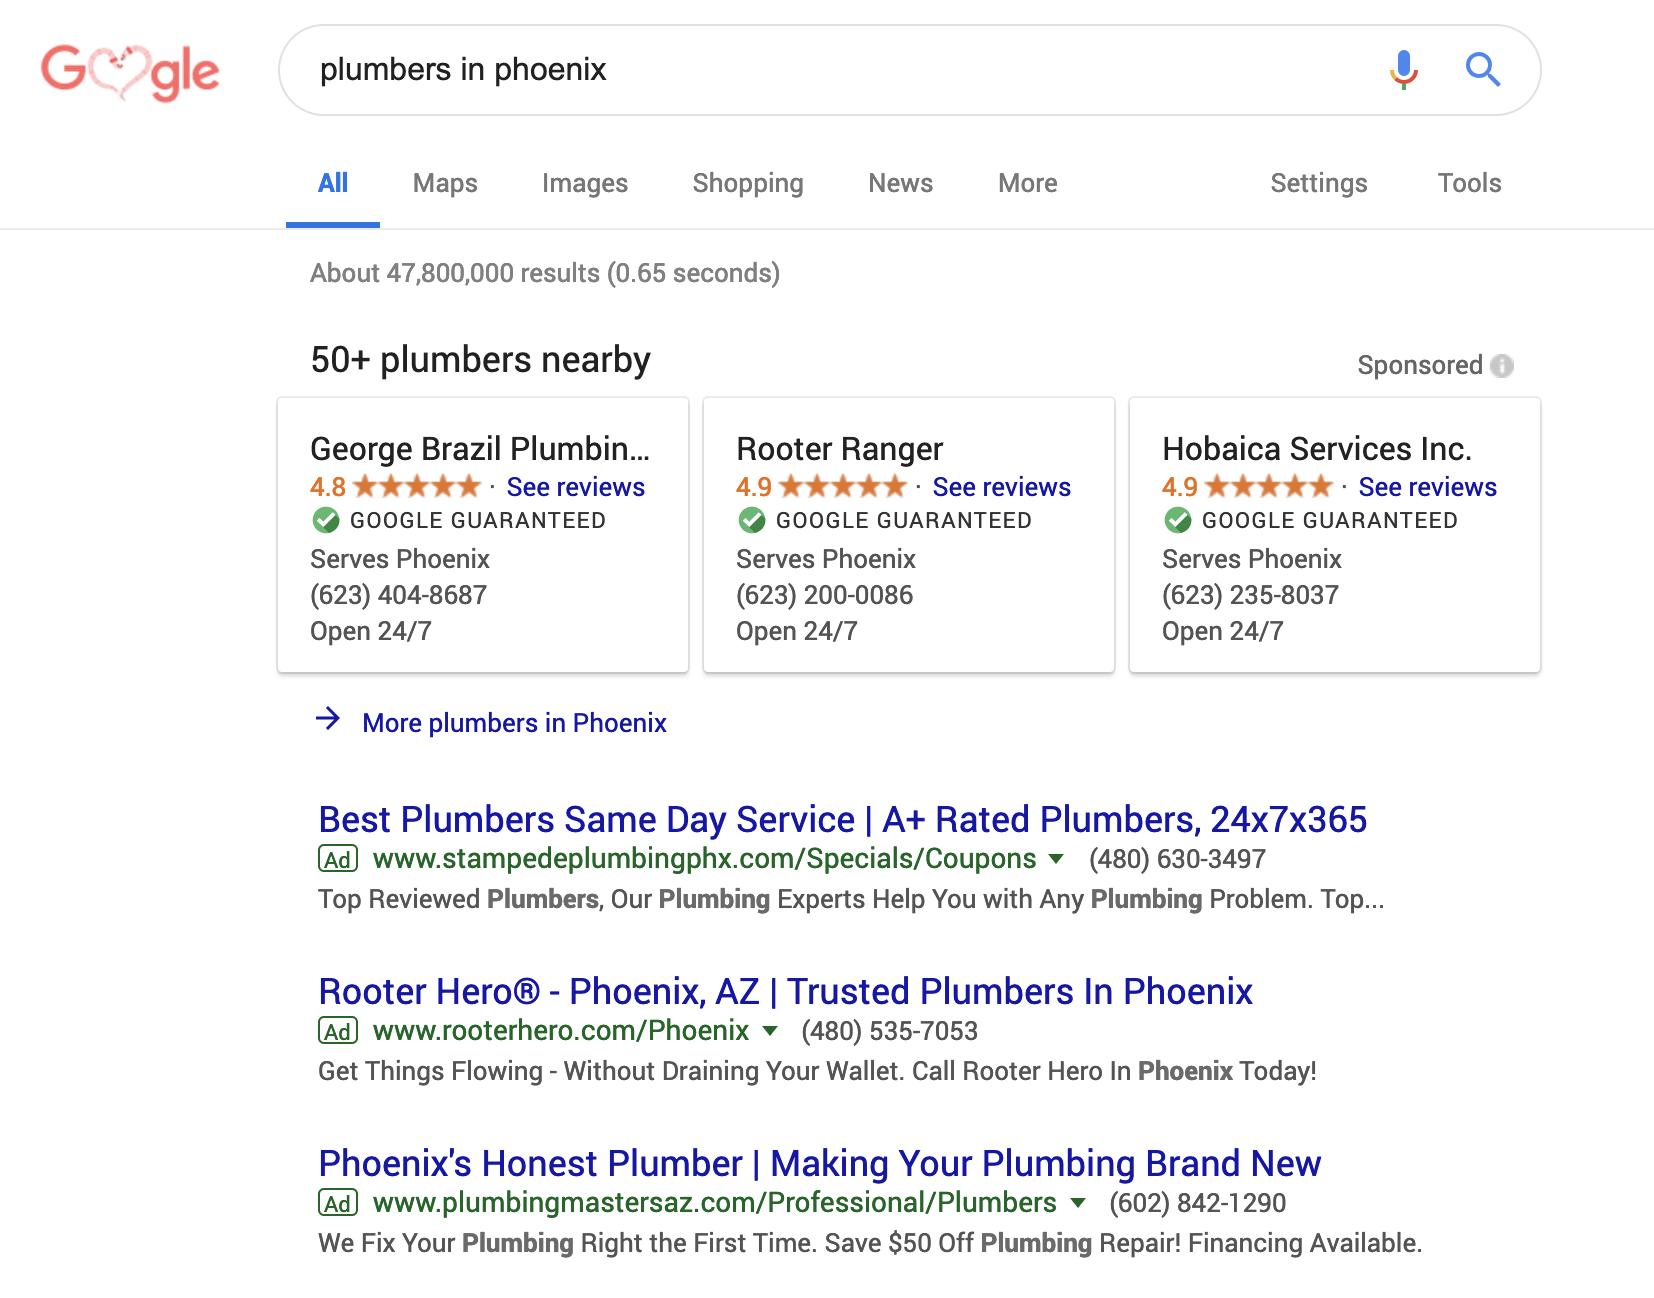 A screenshot of the Google ad platform.